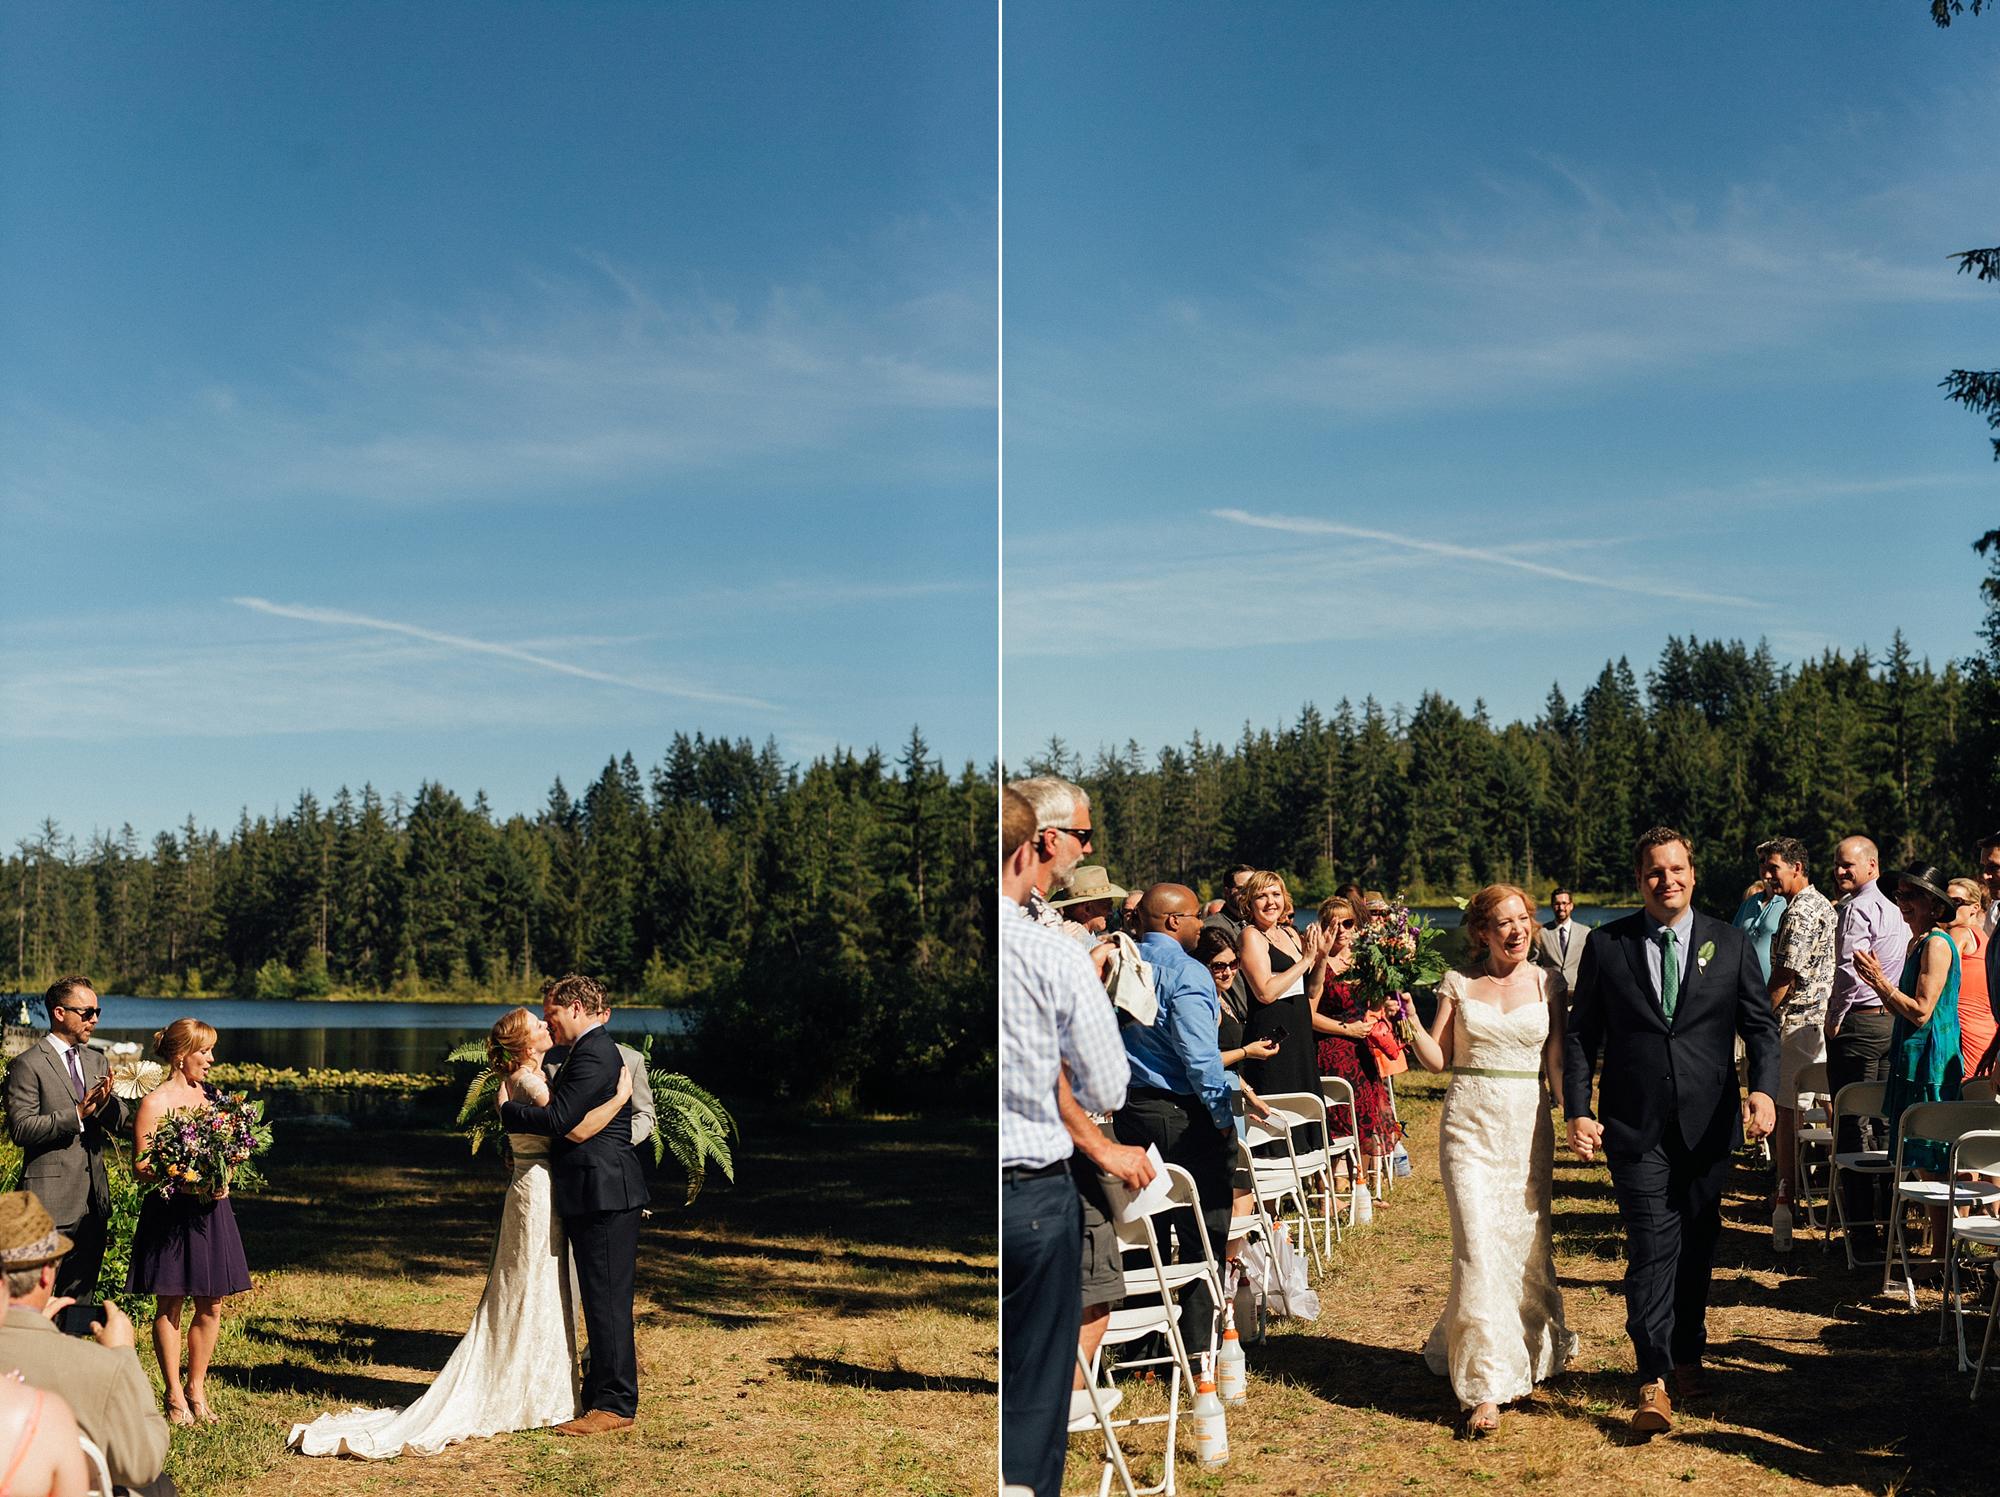 ashley vos photography seattle area wedding photographer_0706.jpg